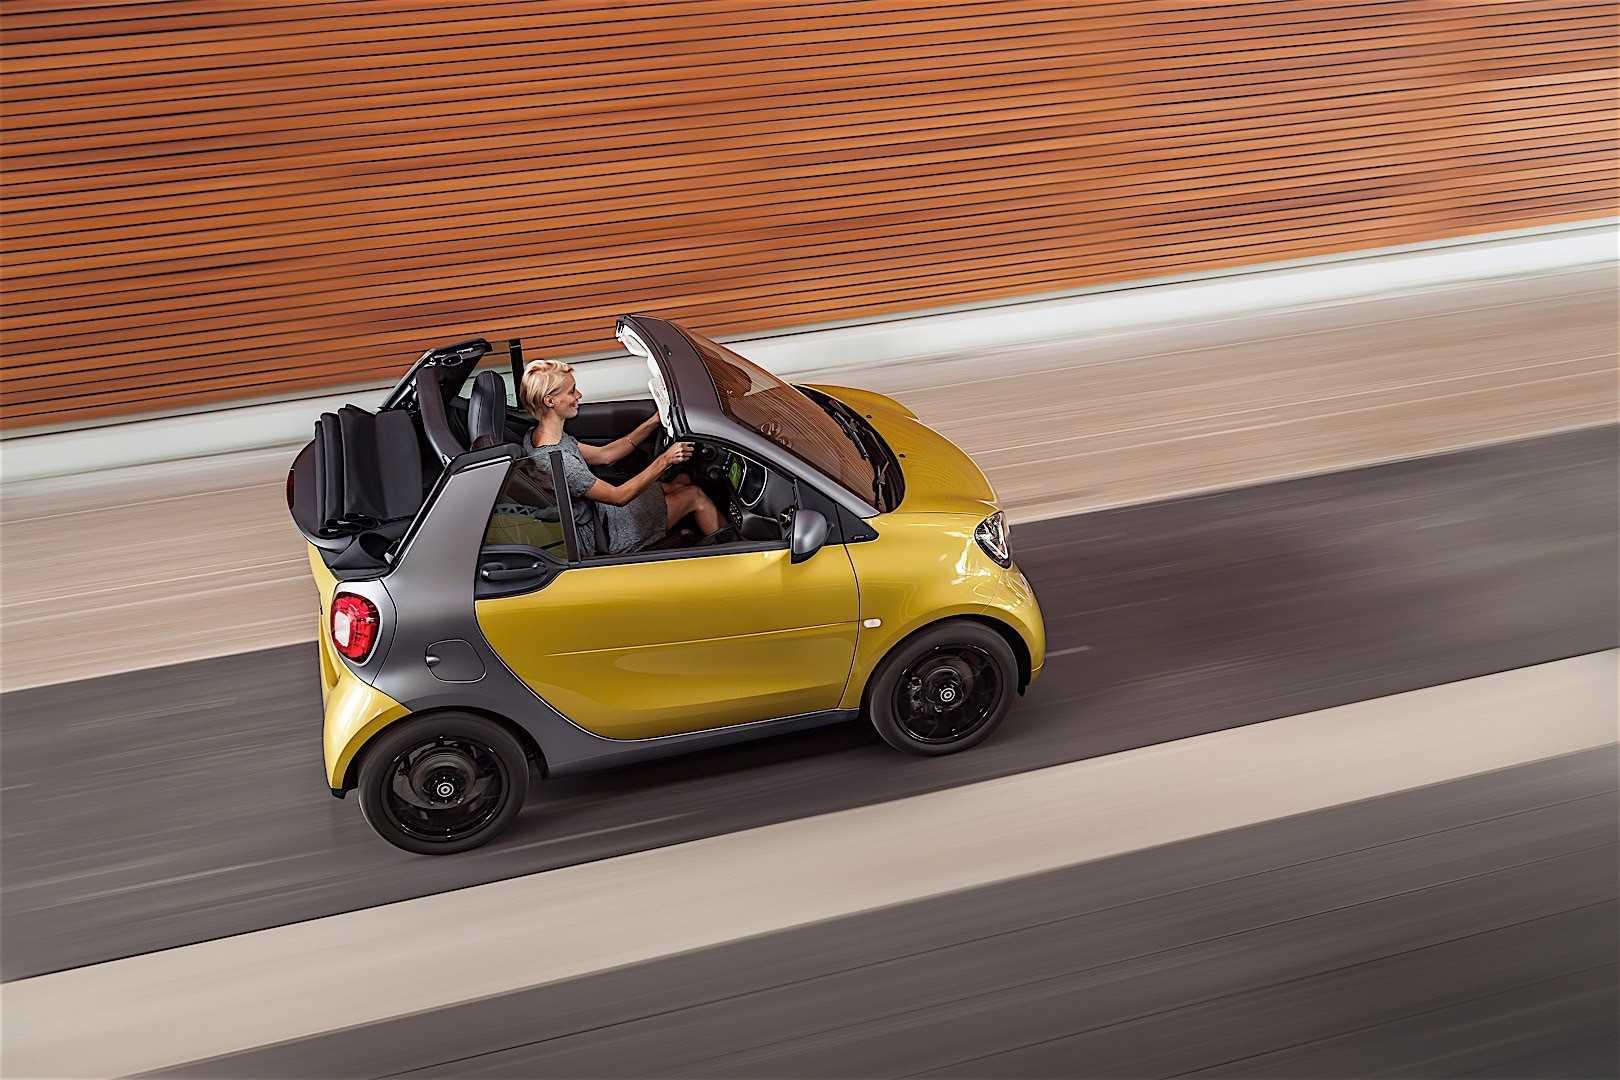 Smart привезет во франкфурт новый кабриолет fortwo